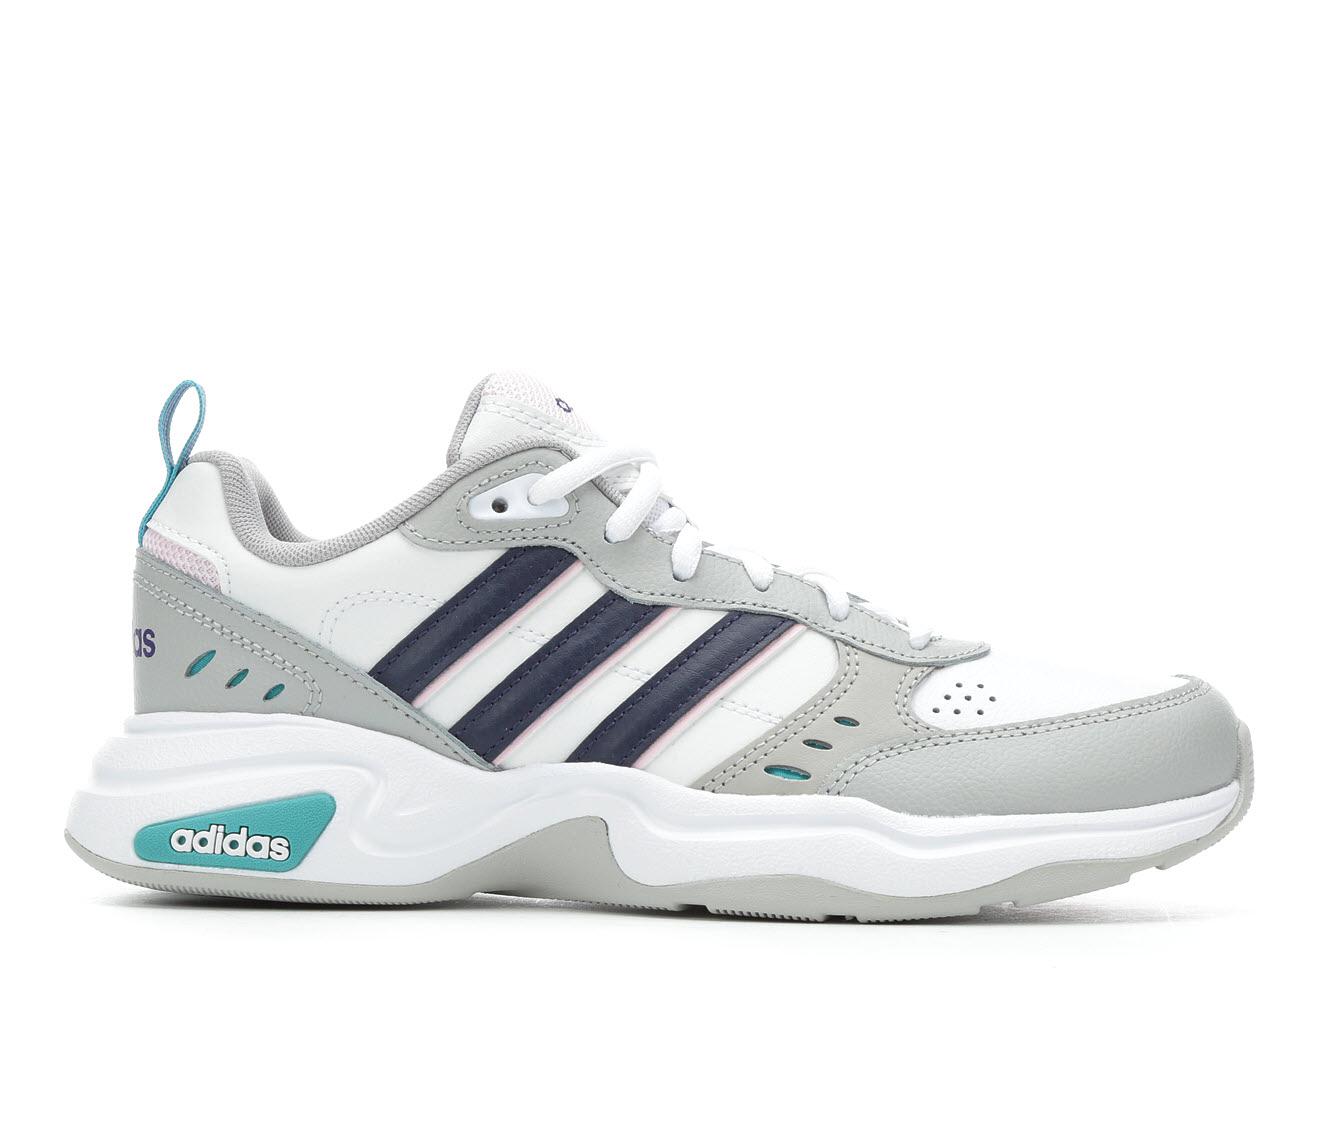 Adidas Strutter Women's Athletic Shoe (White)